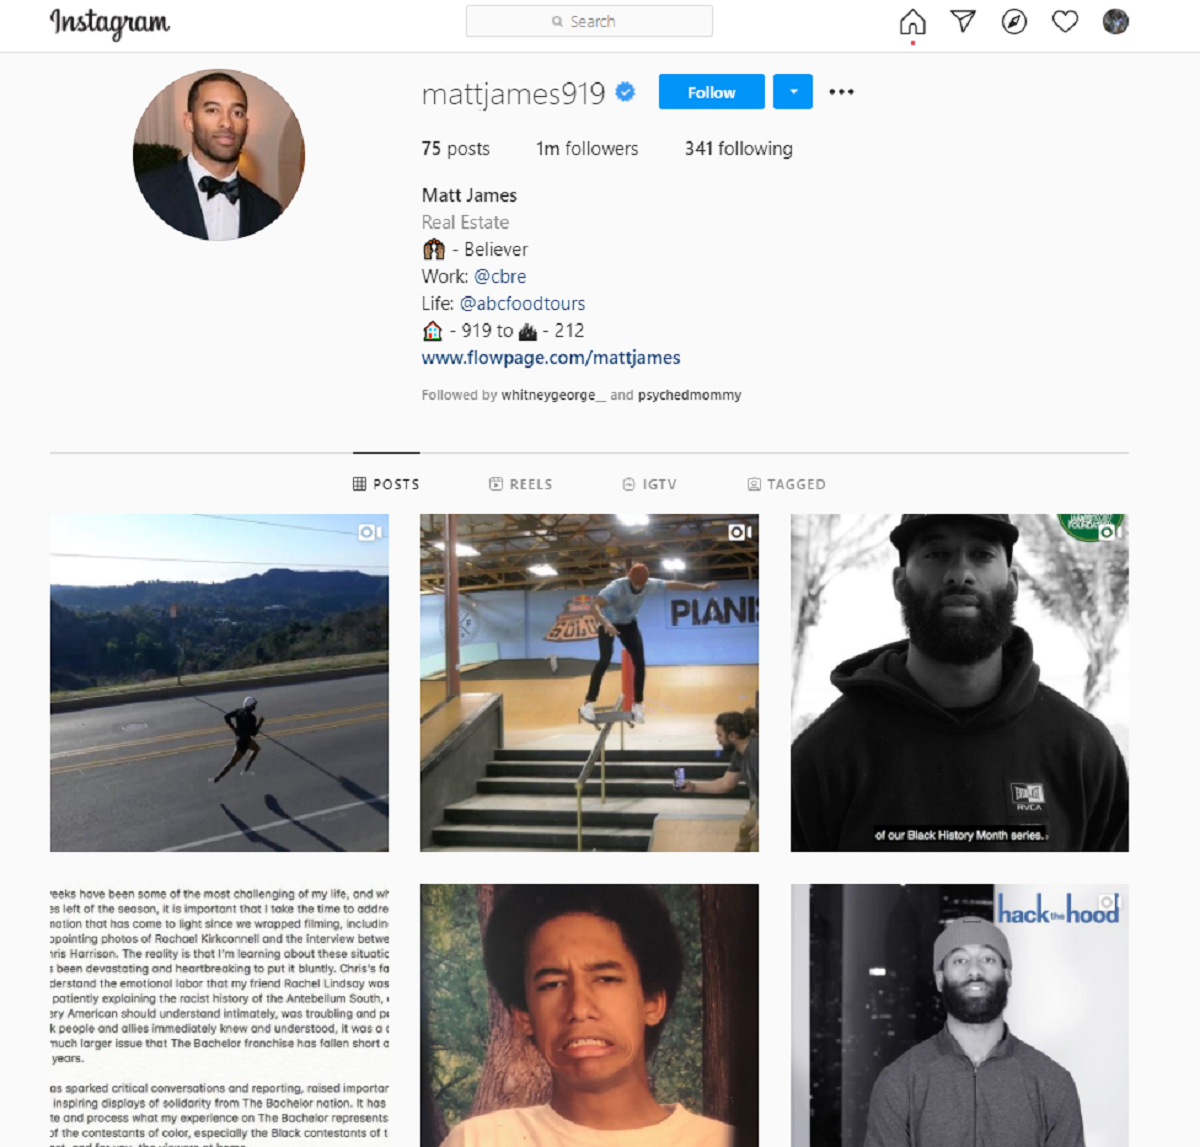 Matt James Instagram is now Bachelor free